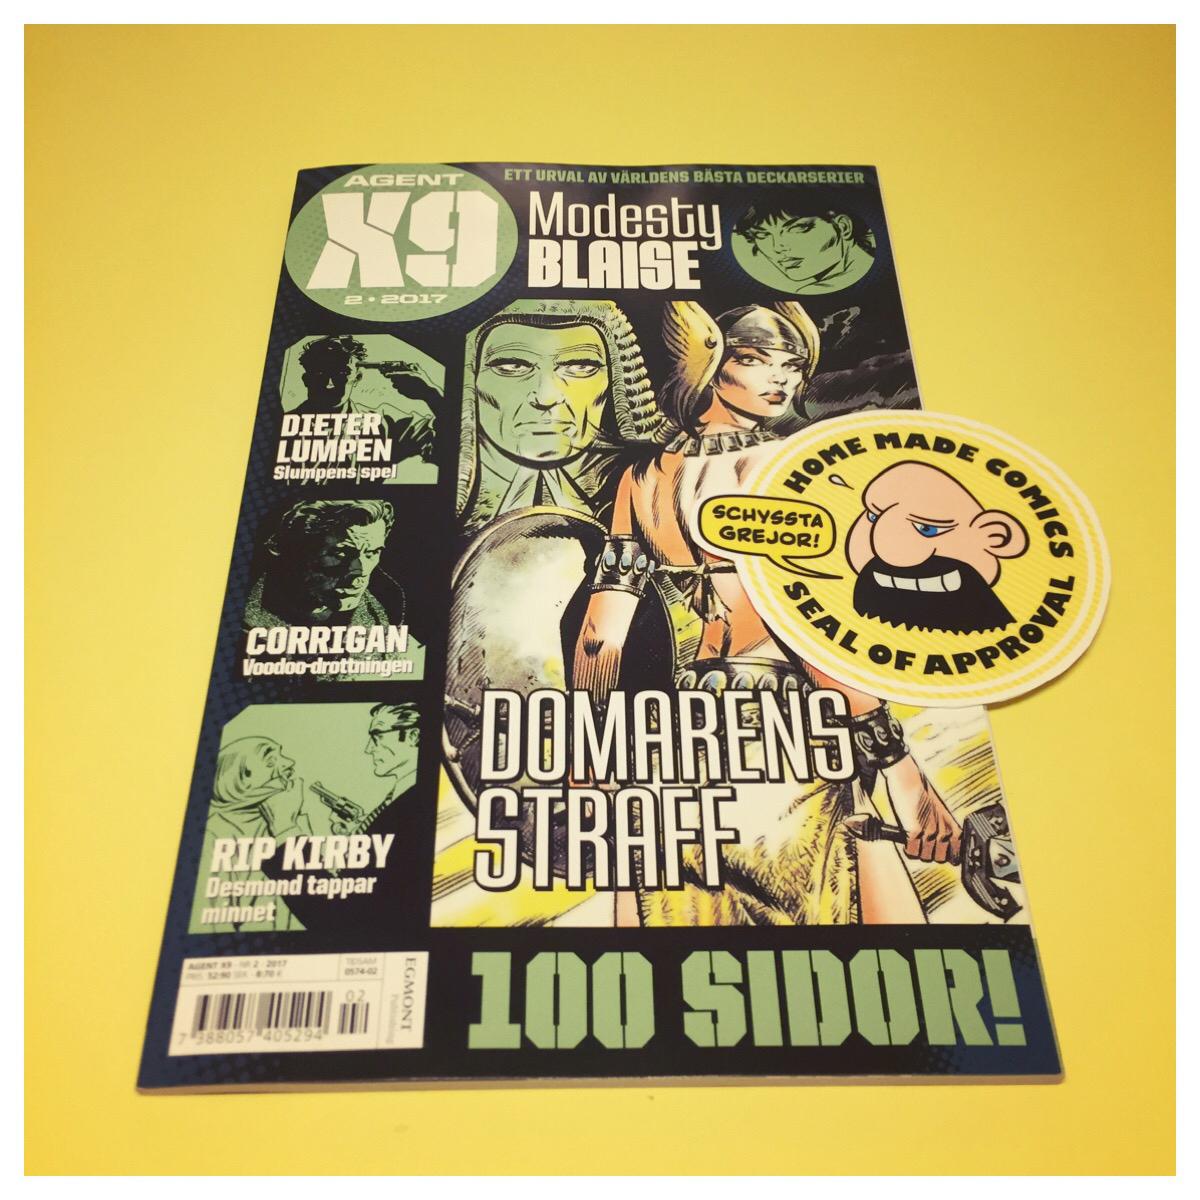 Home Made Comics Seal of Approval #187. Agent X9 2017-2 utgiven av Egmont.